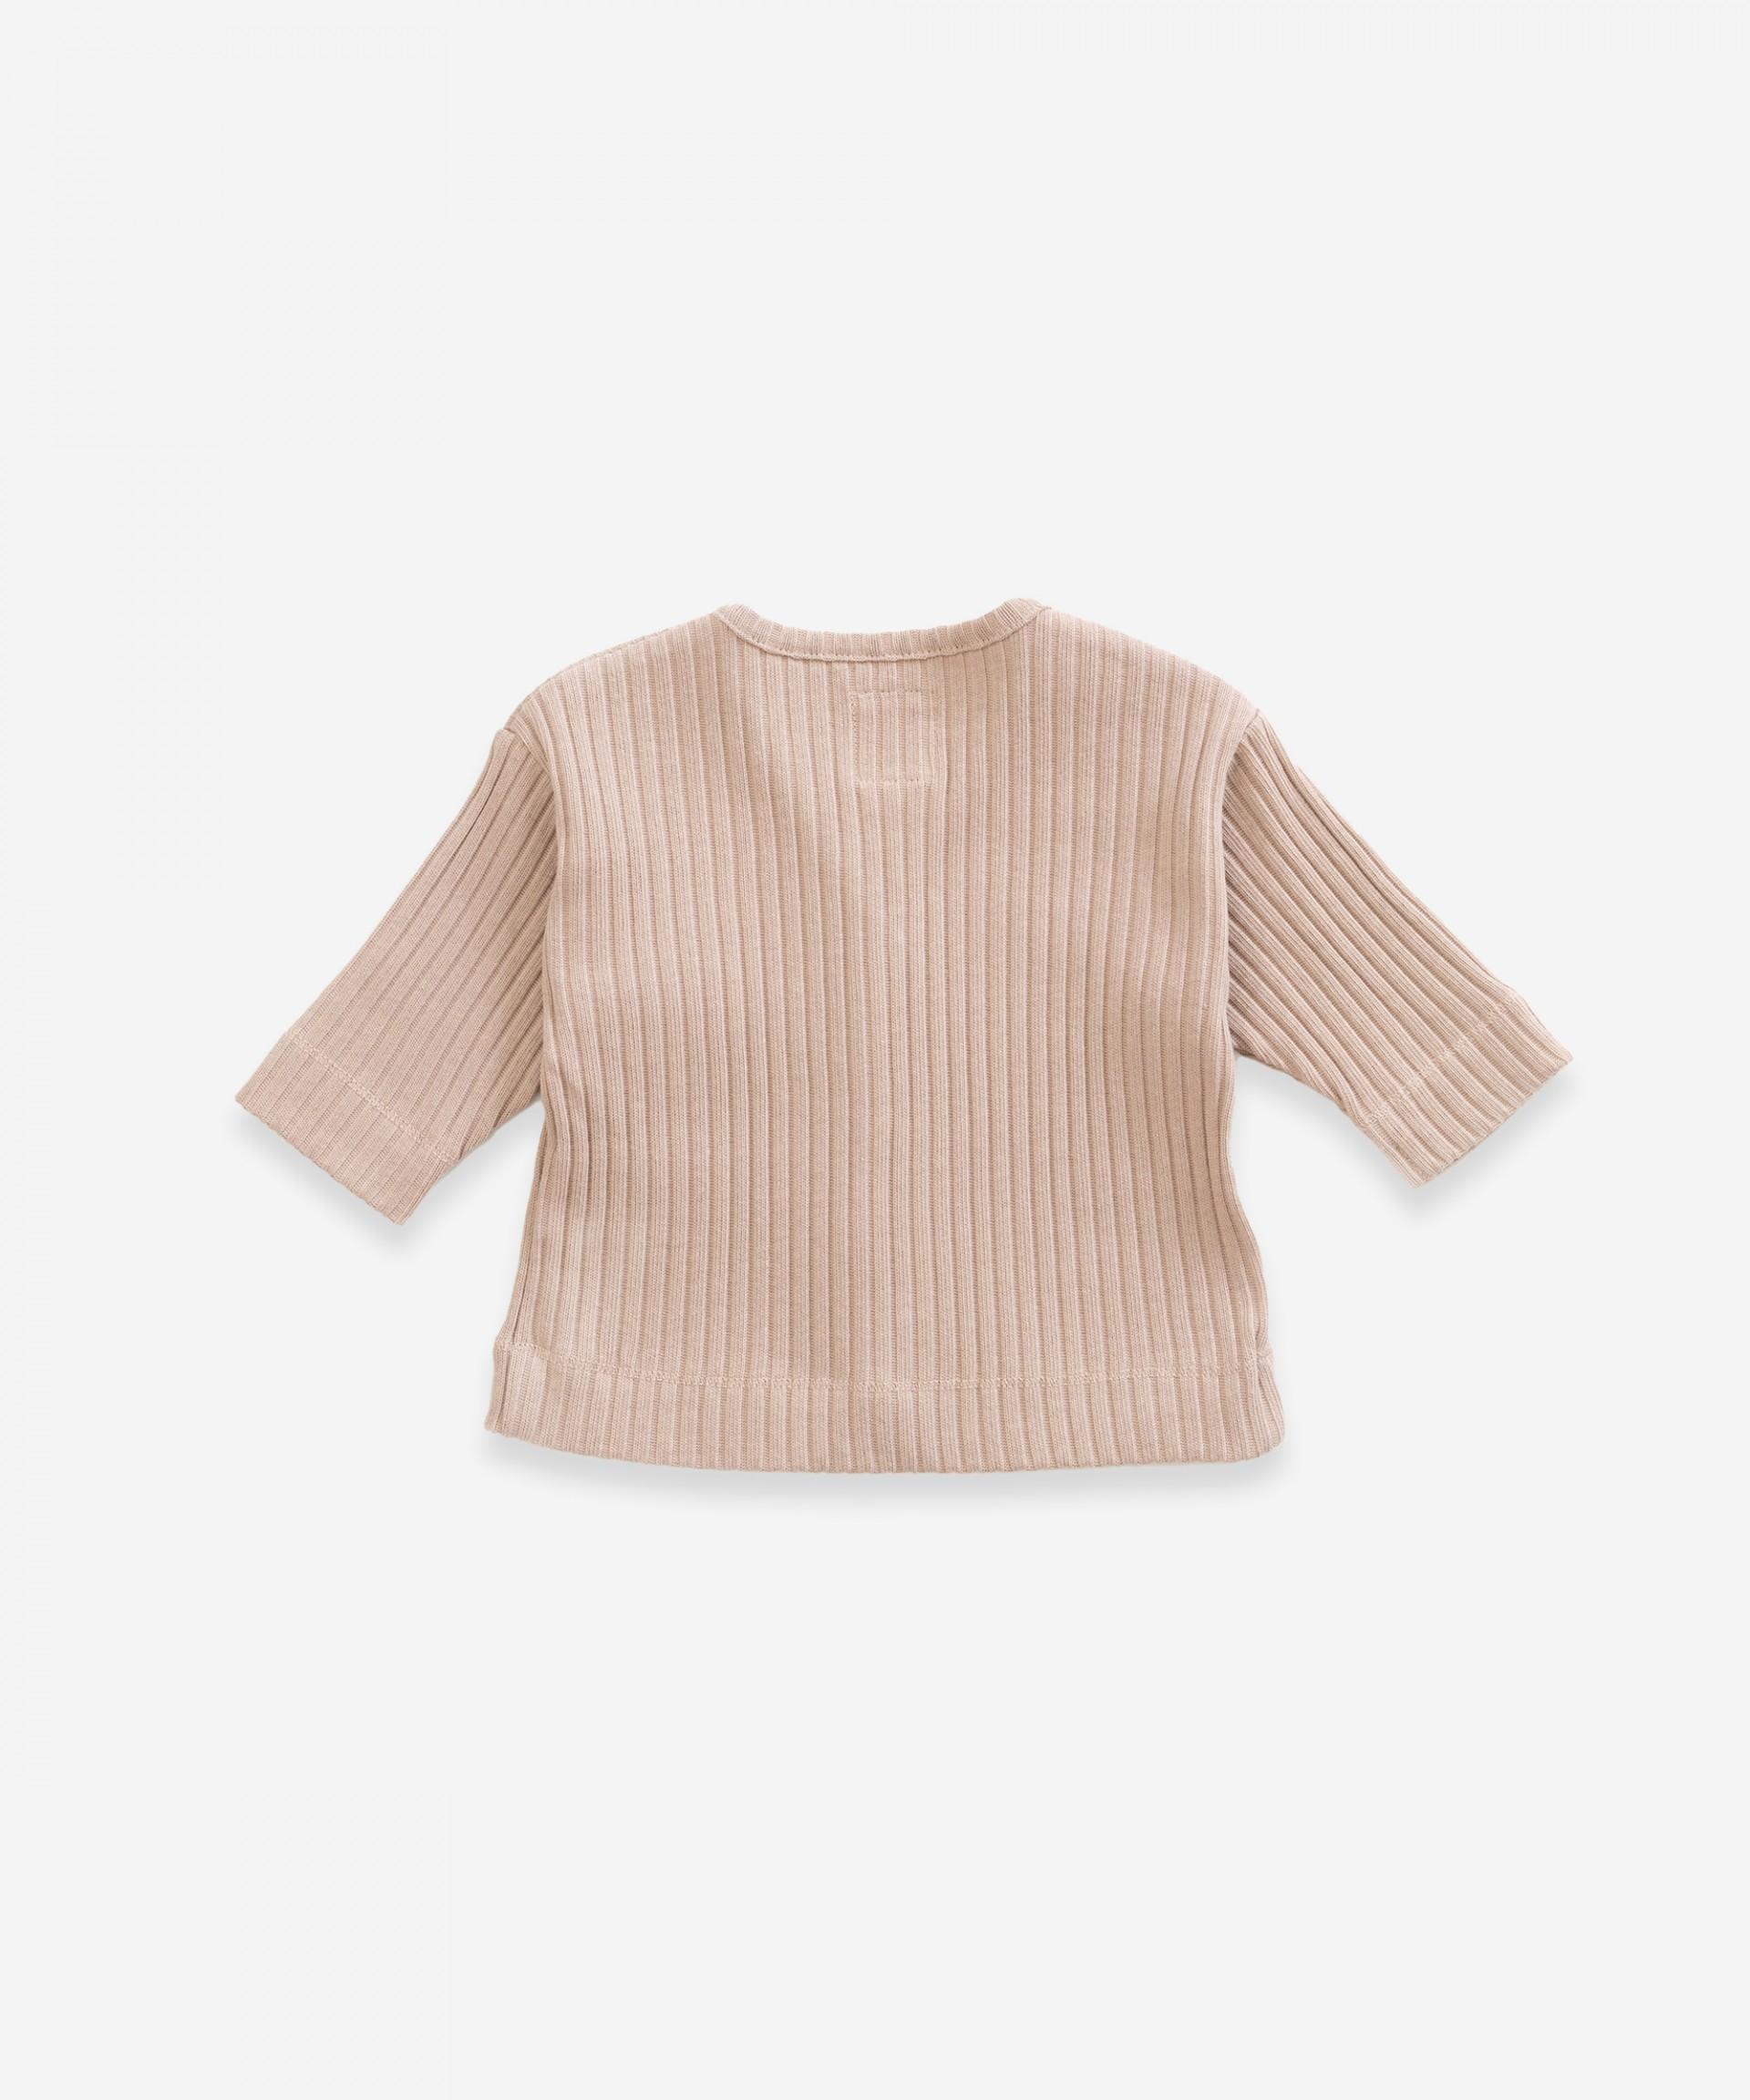 Cardigan | Weaving